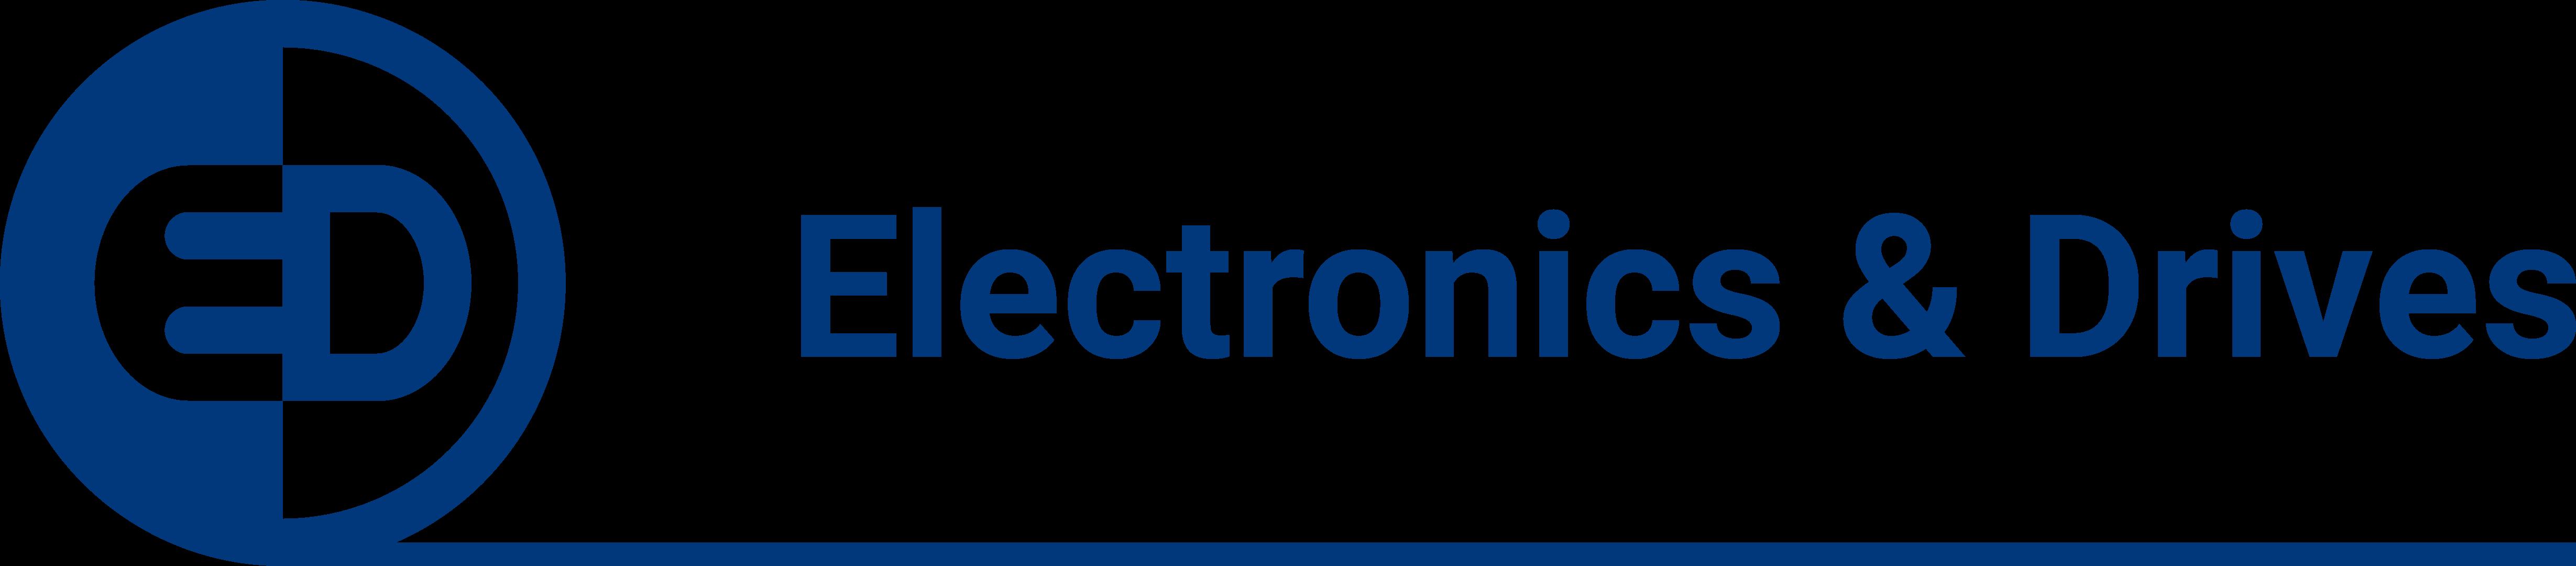 Kooperation mit dem E&D (ehem. RBZ: Robert Bosch Zentrum für Leistungselektronik)